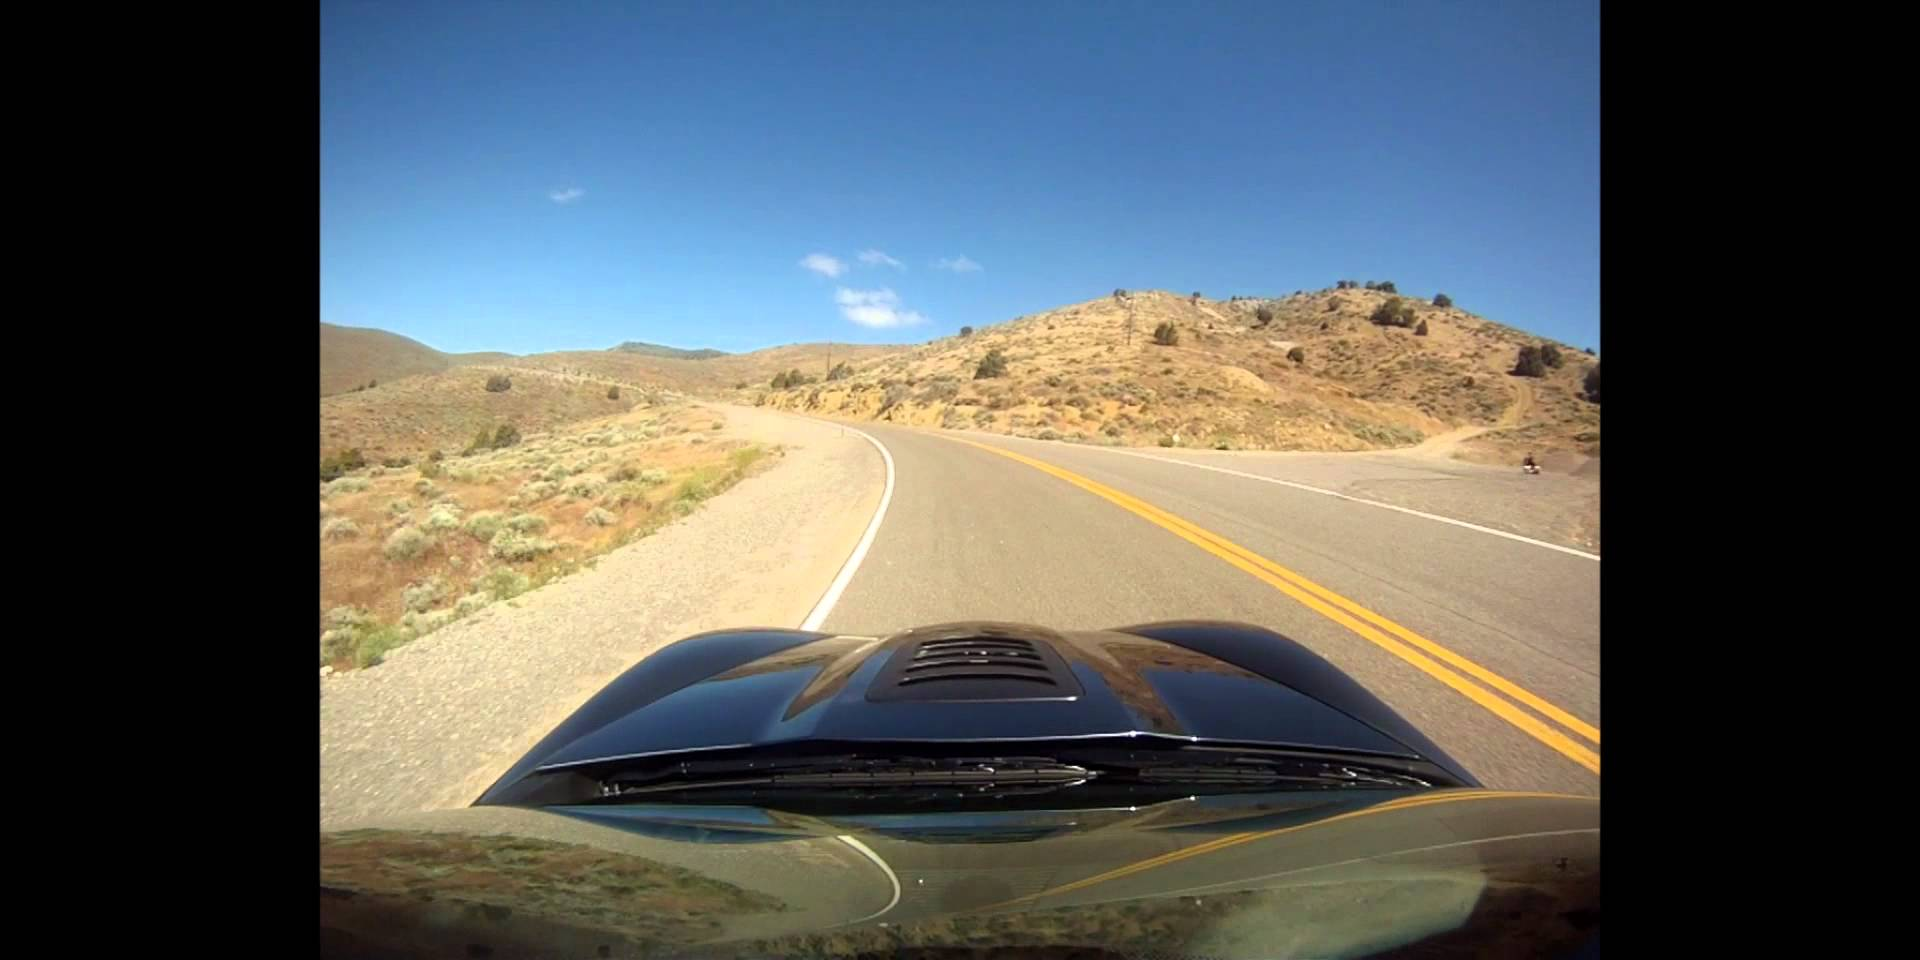 Hop On Board LG Motorsports' Corvette ZR1 for the The Spectre 341 Hillclimb